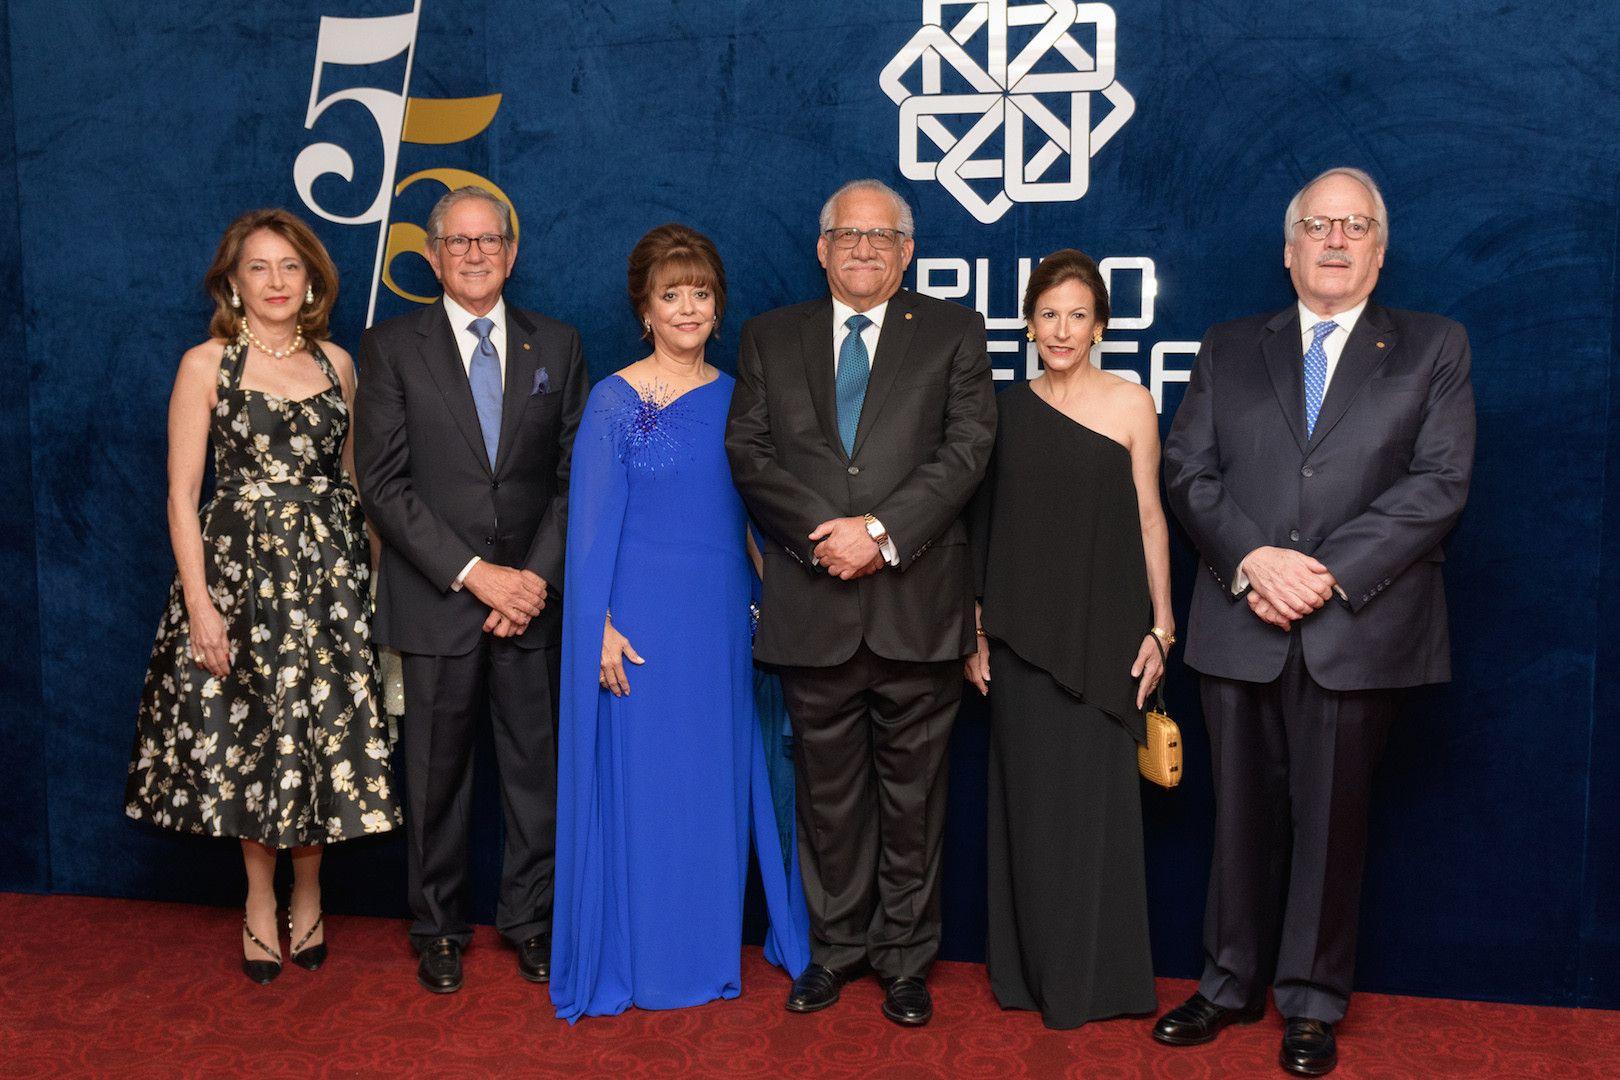 Grupo Universal celebra 55 aniversario con una gala concierto